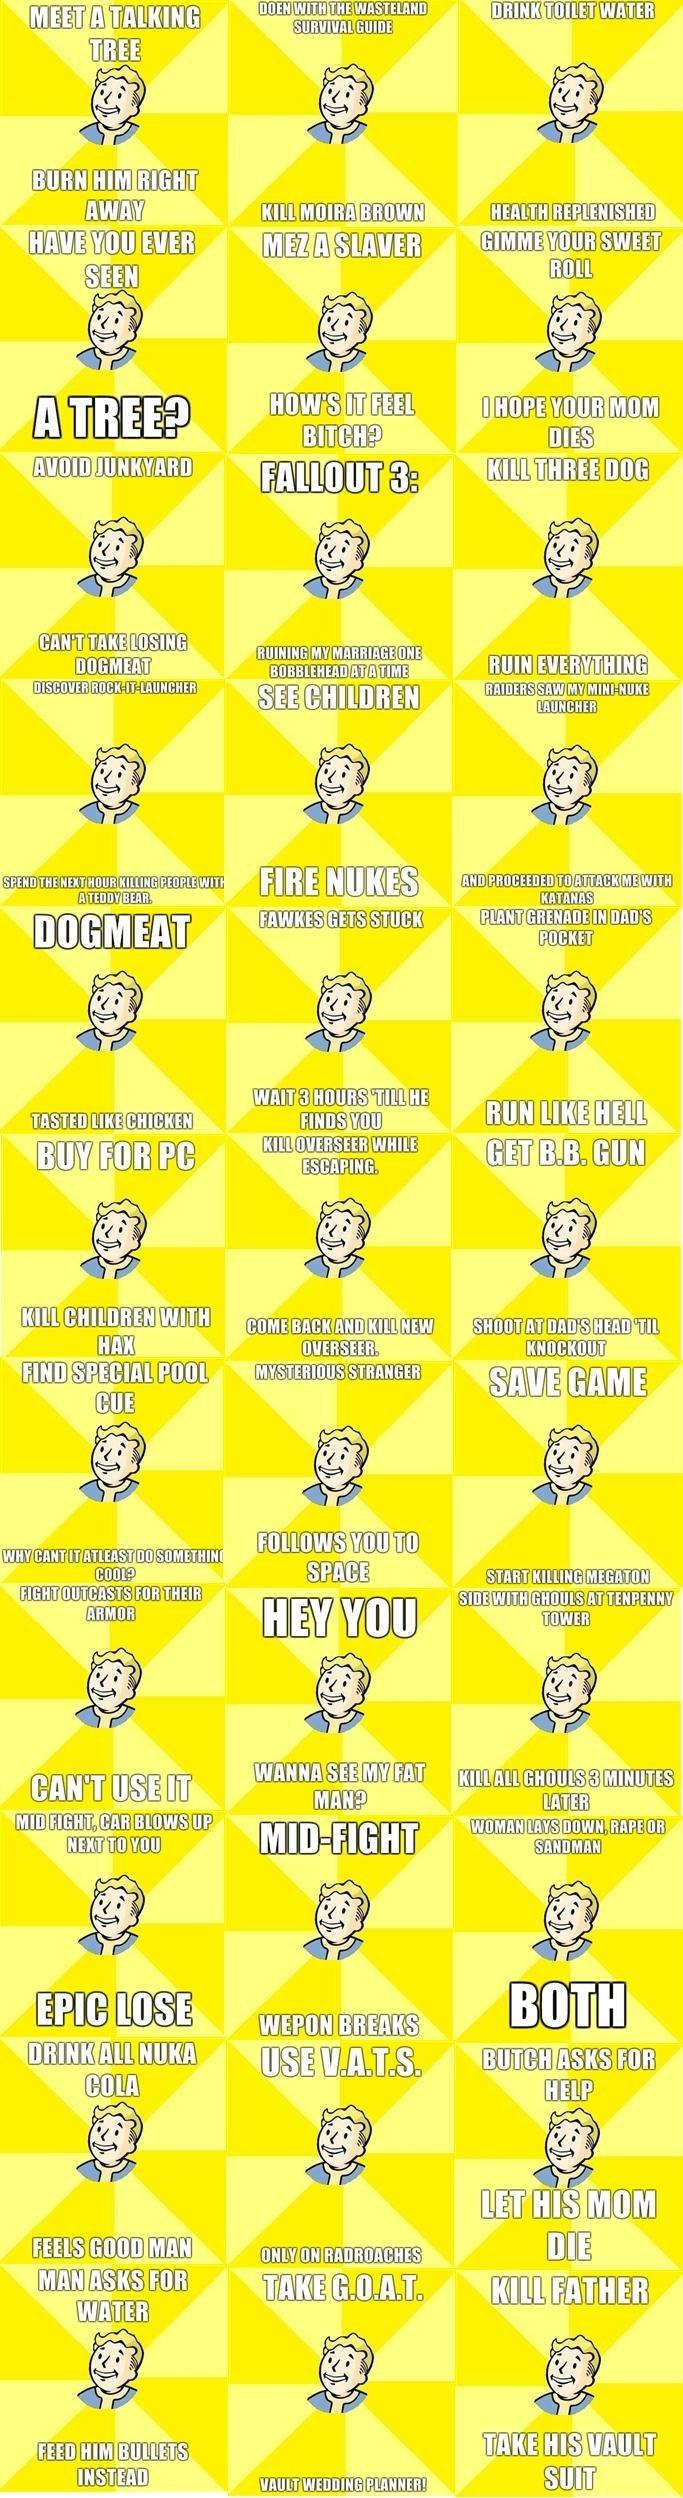 "Fallout Compilation. Fallout Compilation, enjoy. fii"" aii! Cirillo) 2 SERGE lap lolgif]  bras, Mlg) awaii""' , tir Efl) flf?. Make More NOW Fallout Compilat"